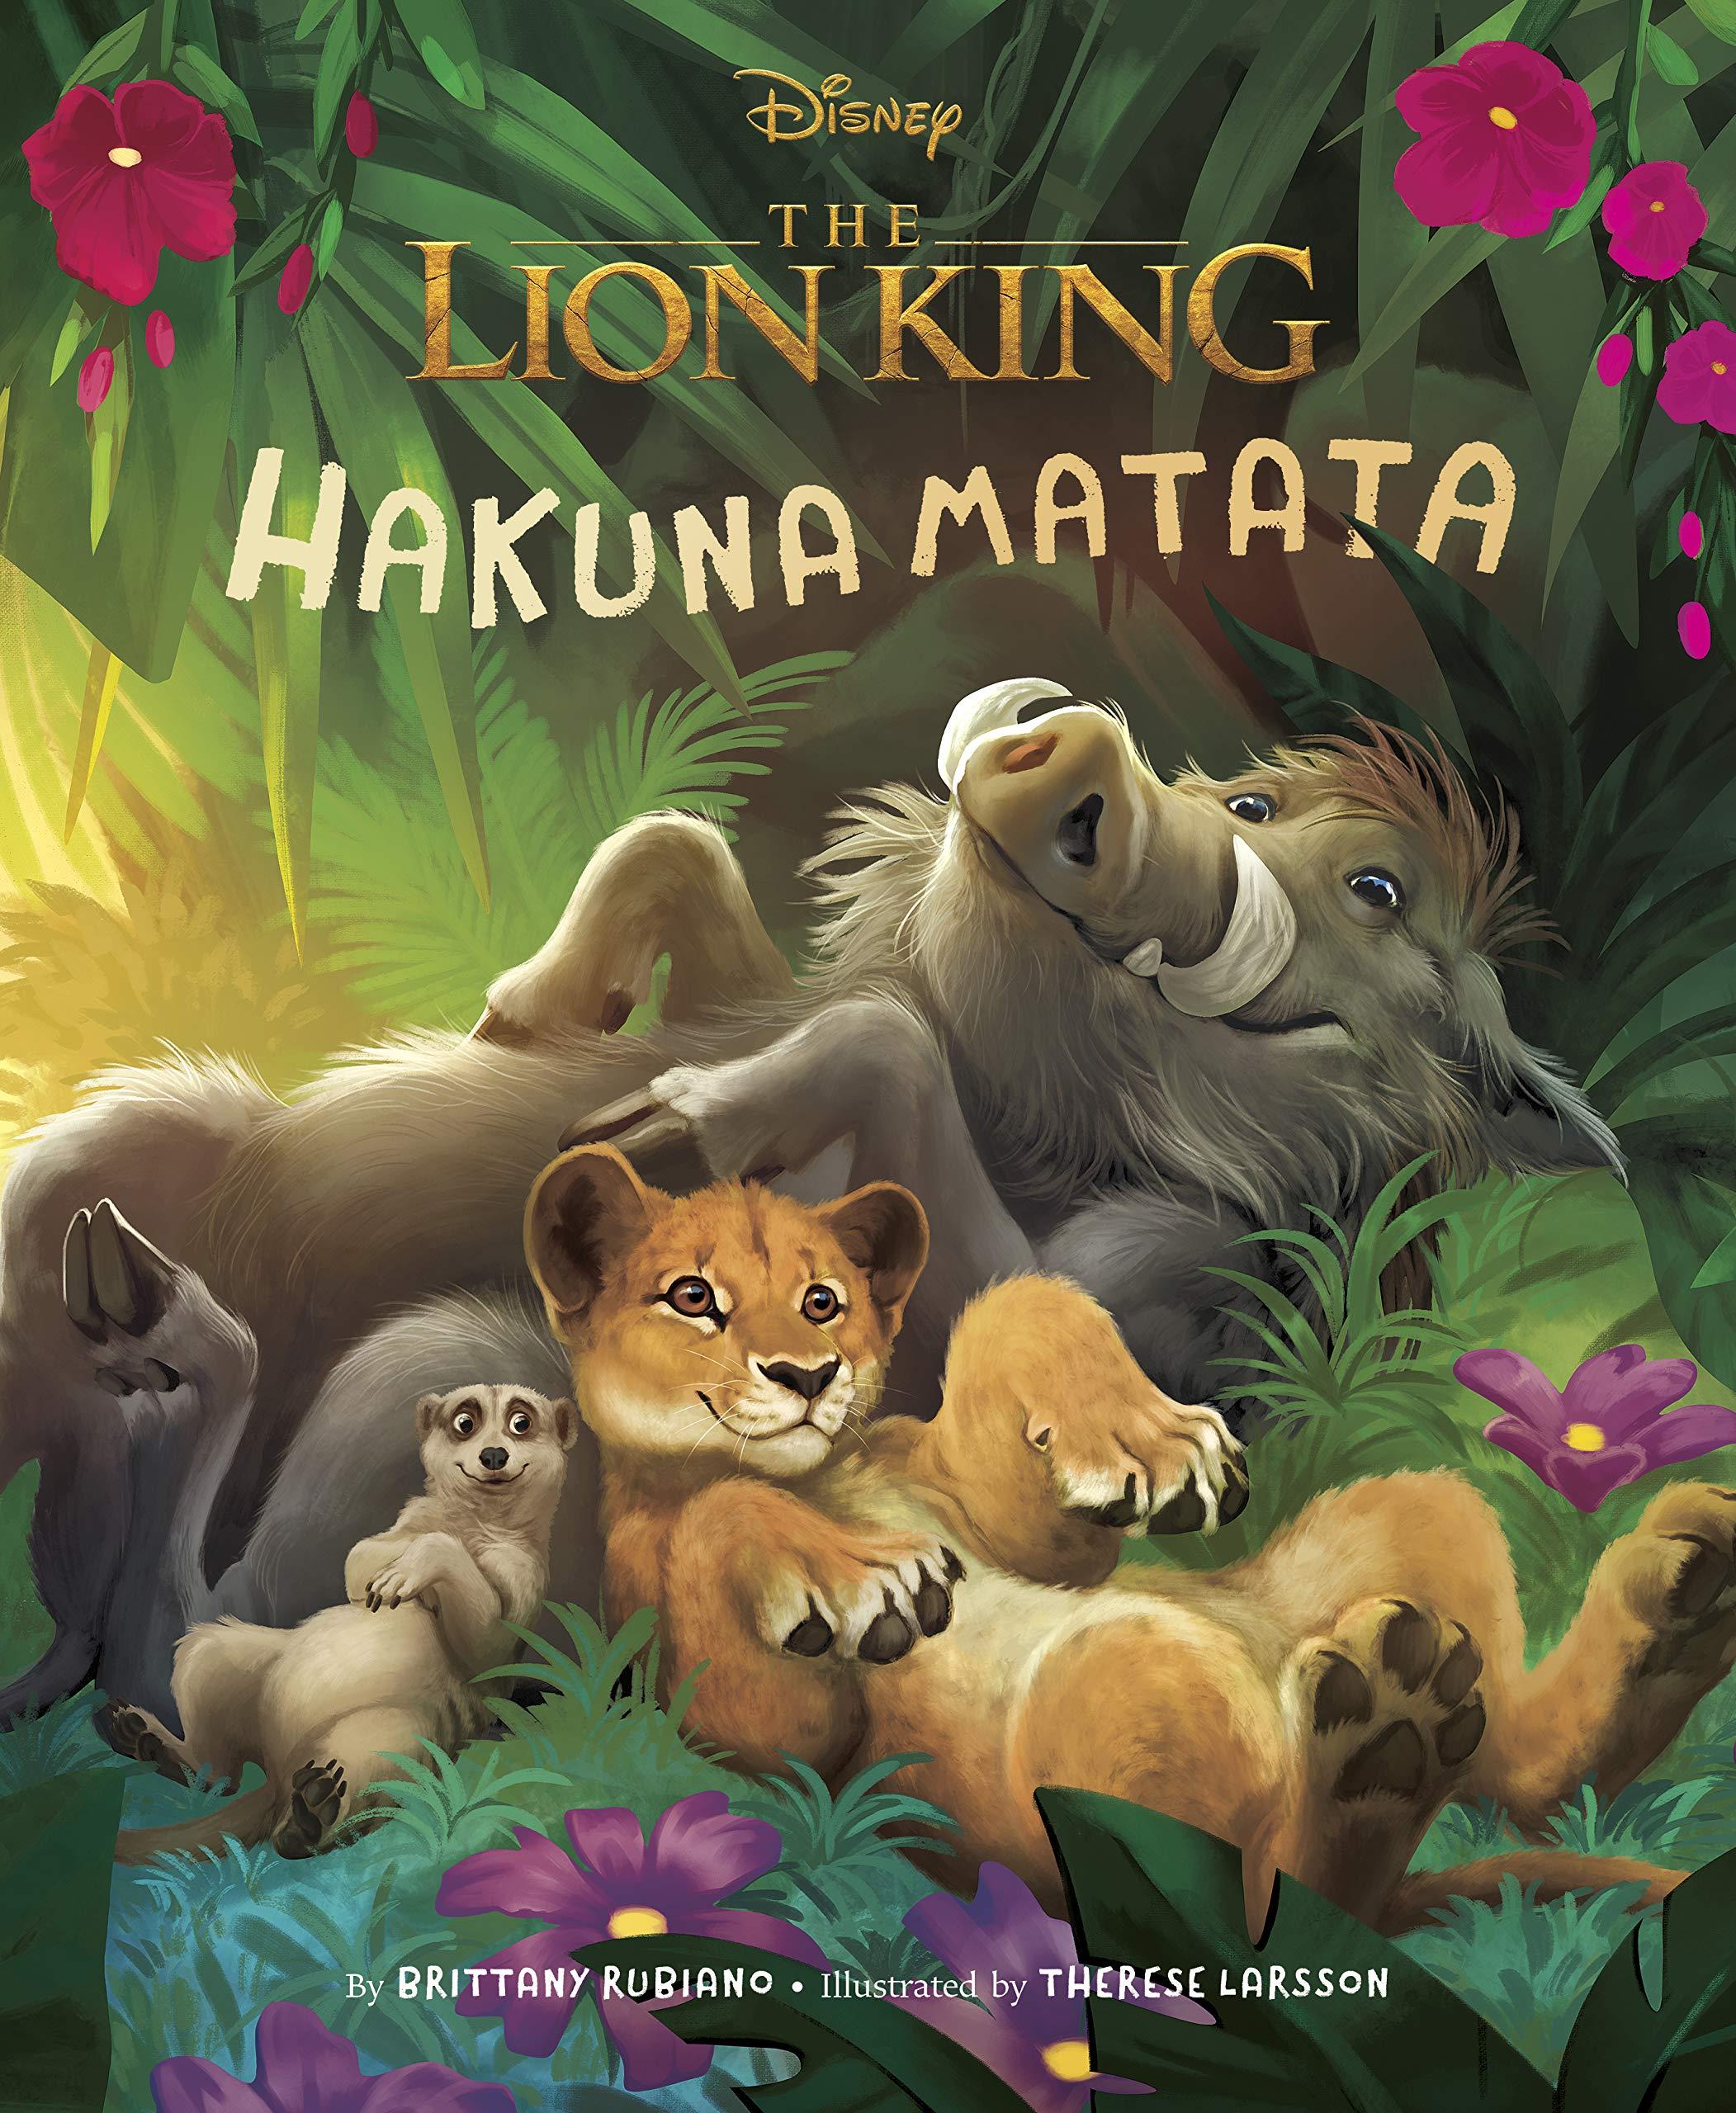 Lion King  2019  Picture Book The  Hakuna Matata